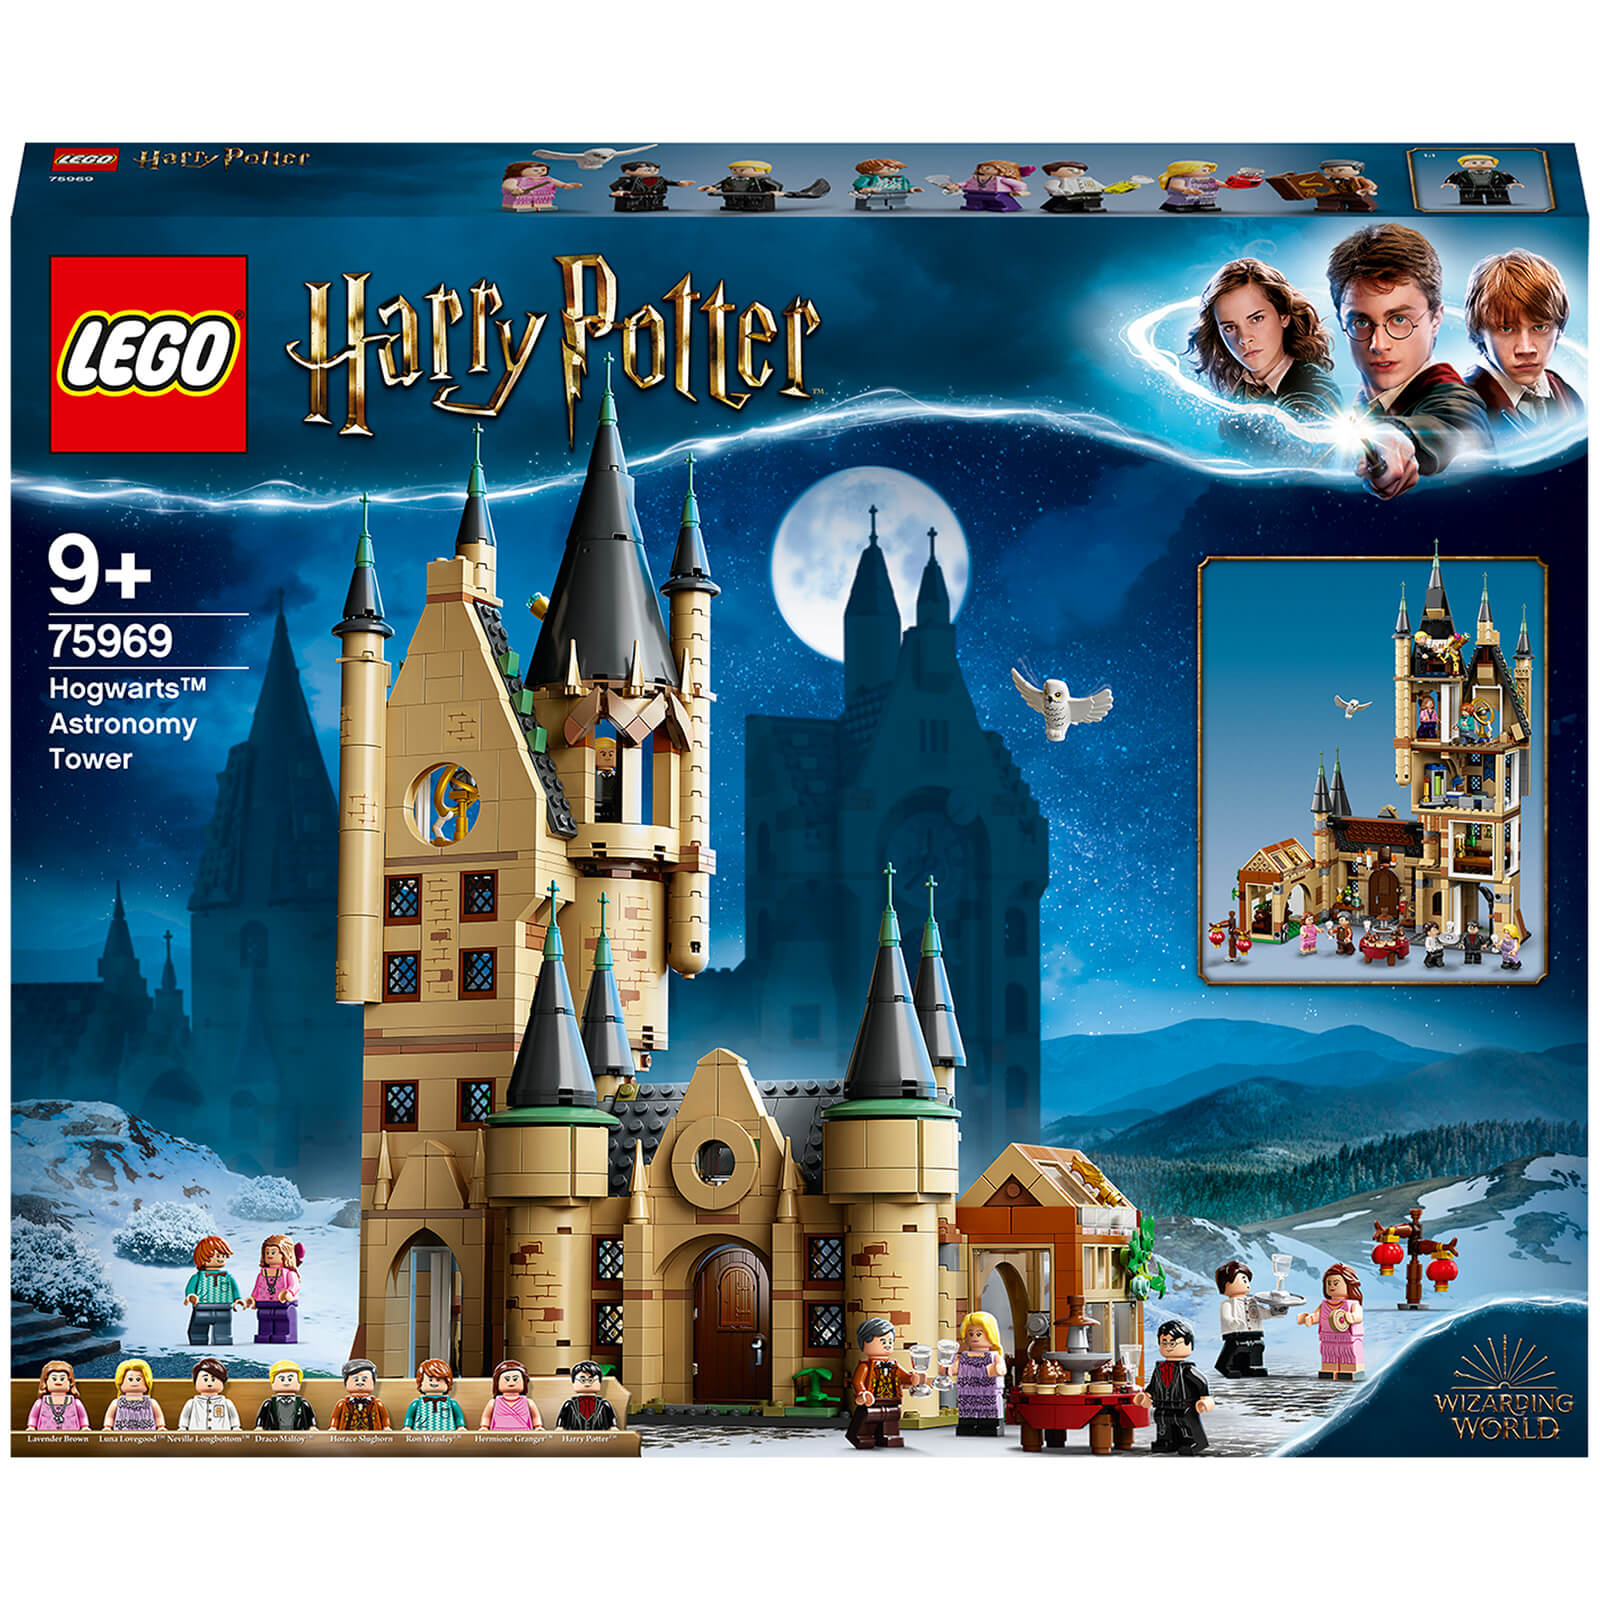 Image of LEGO Harry Potter: Hogwarts Astronomy Tower Play Set (75969)